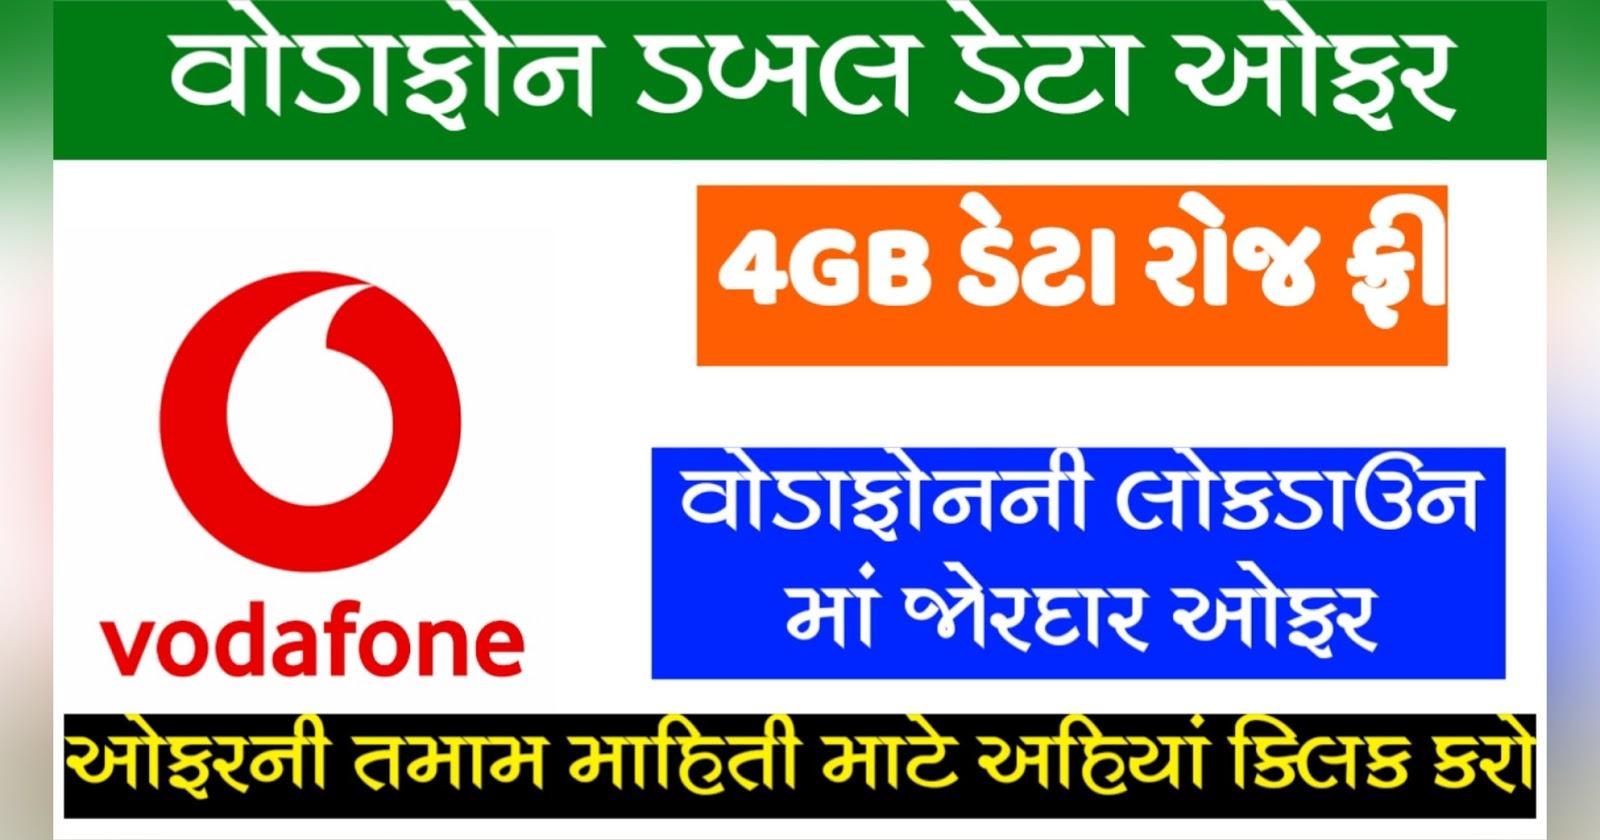 Vodafone Double Data Offer 2020